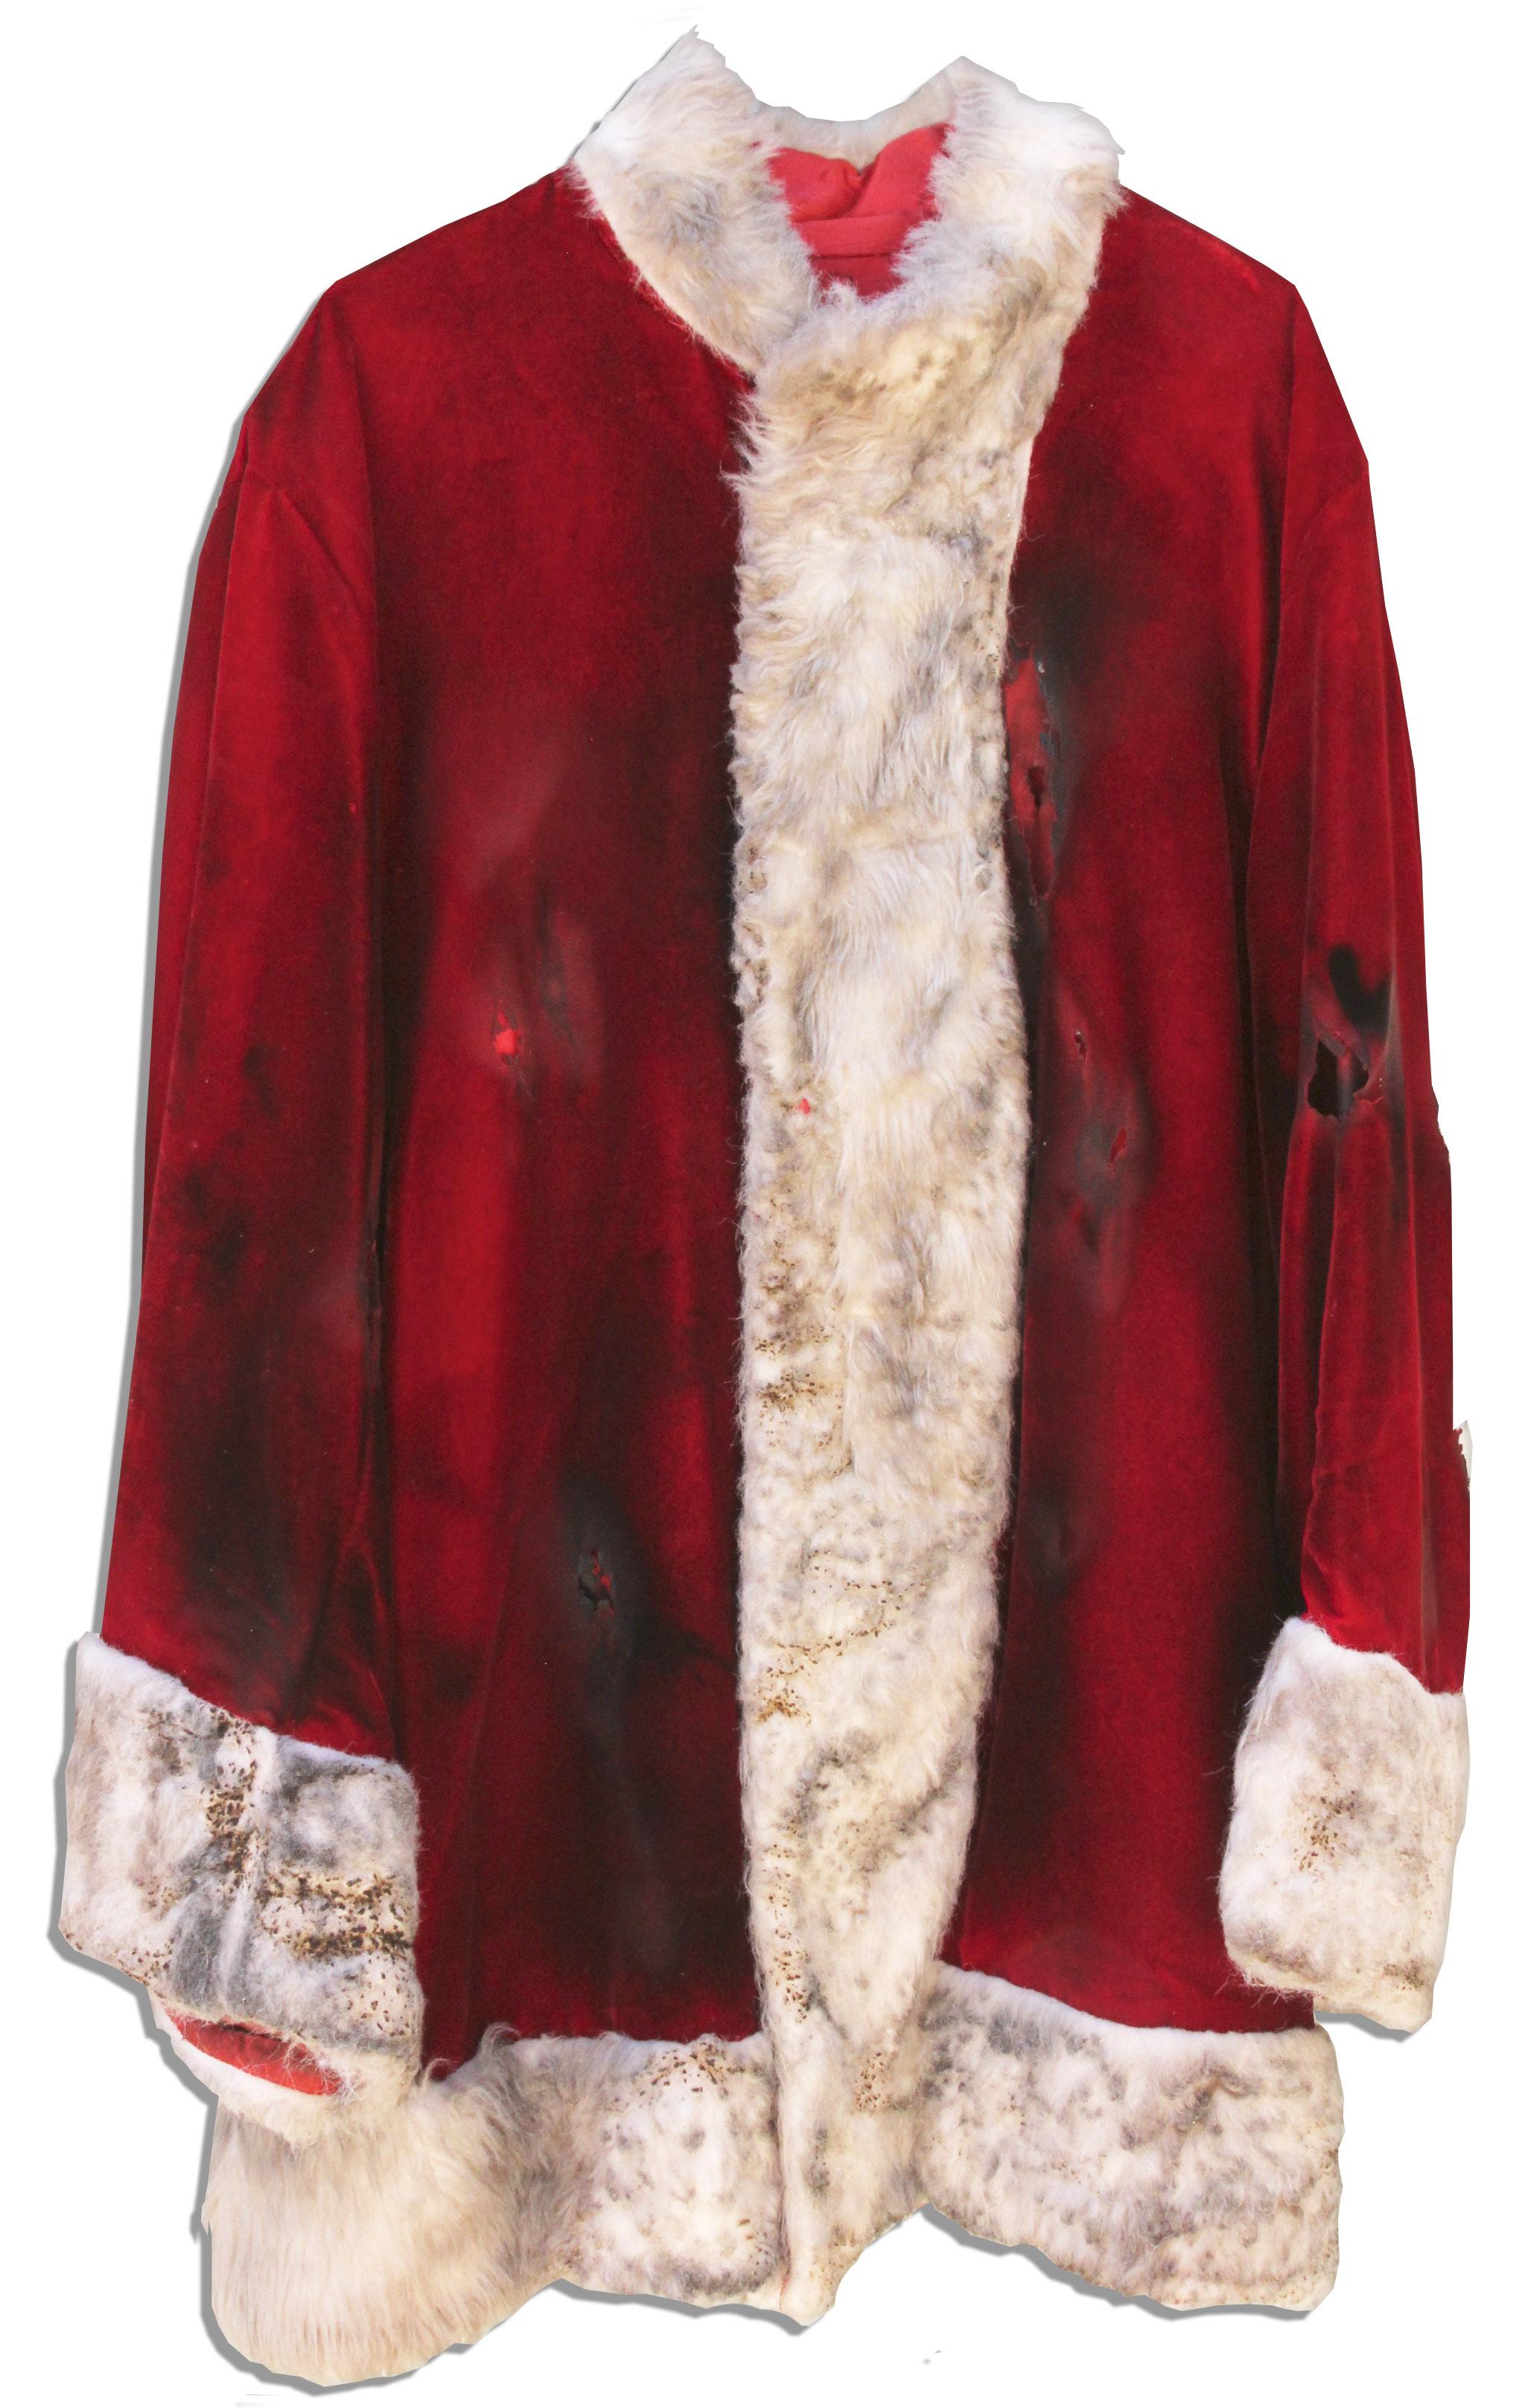 Marshall Ratliff's Santa Claus Suit